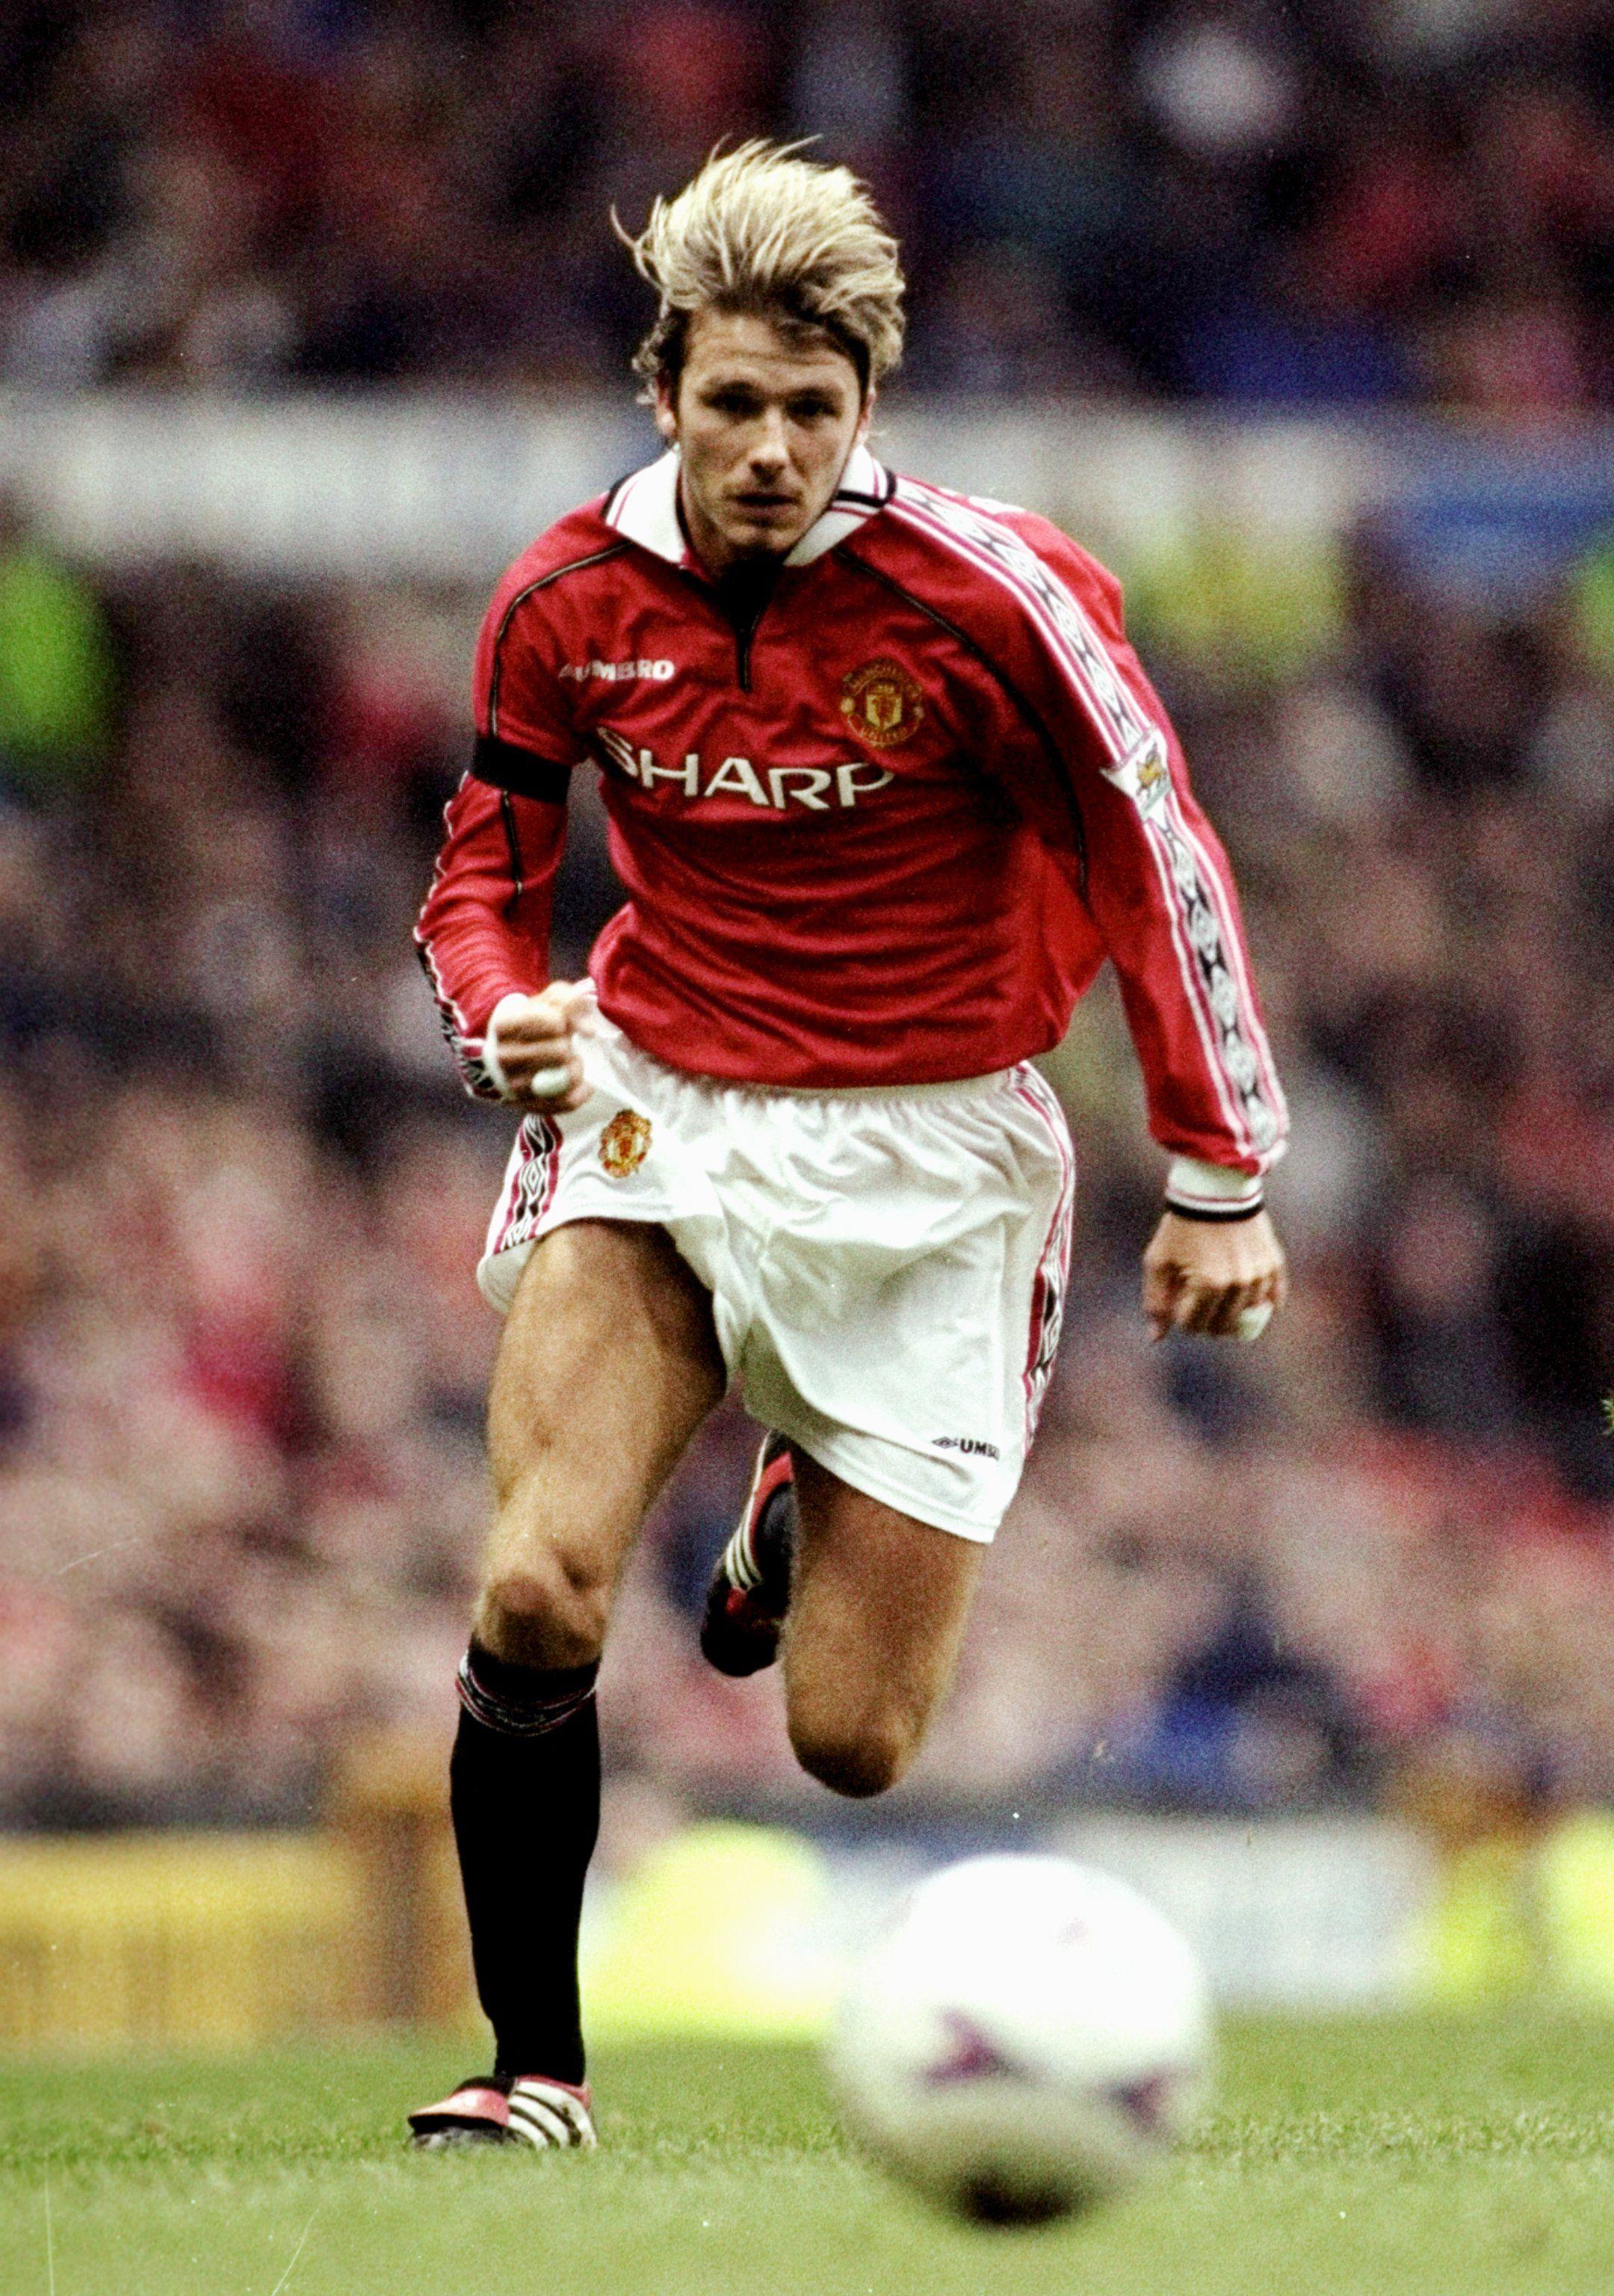 david beckham - adidas predator mania 2002 | theadidaspredator